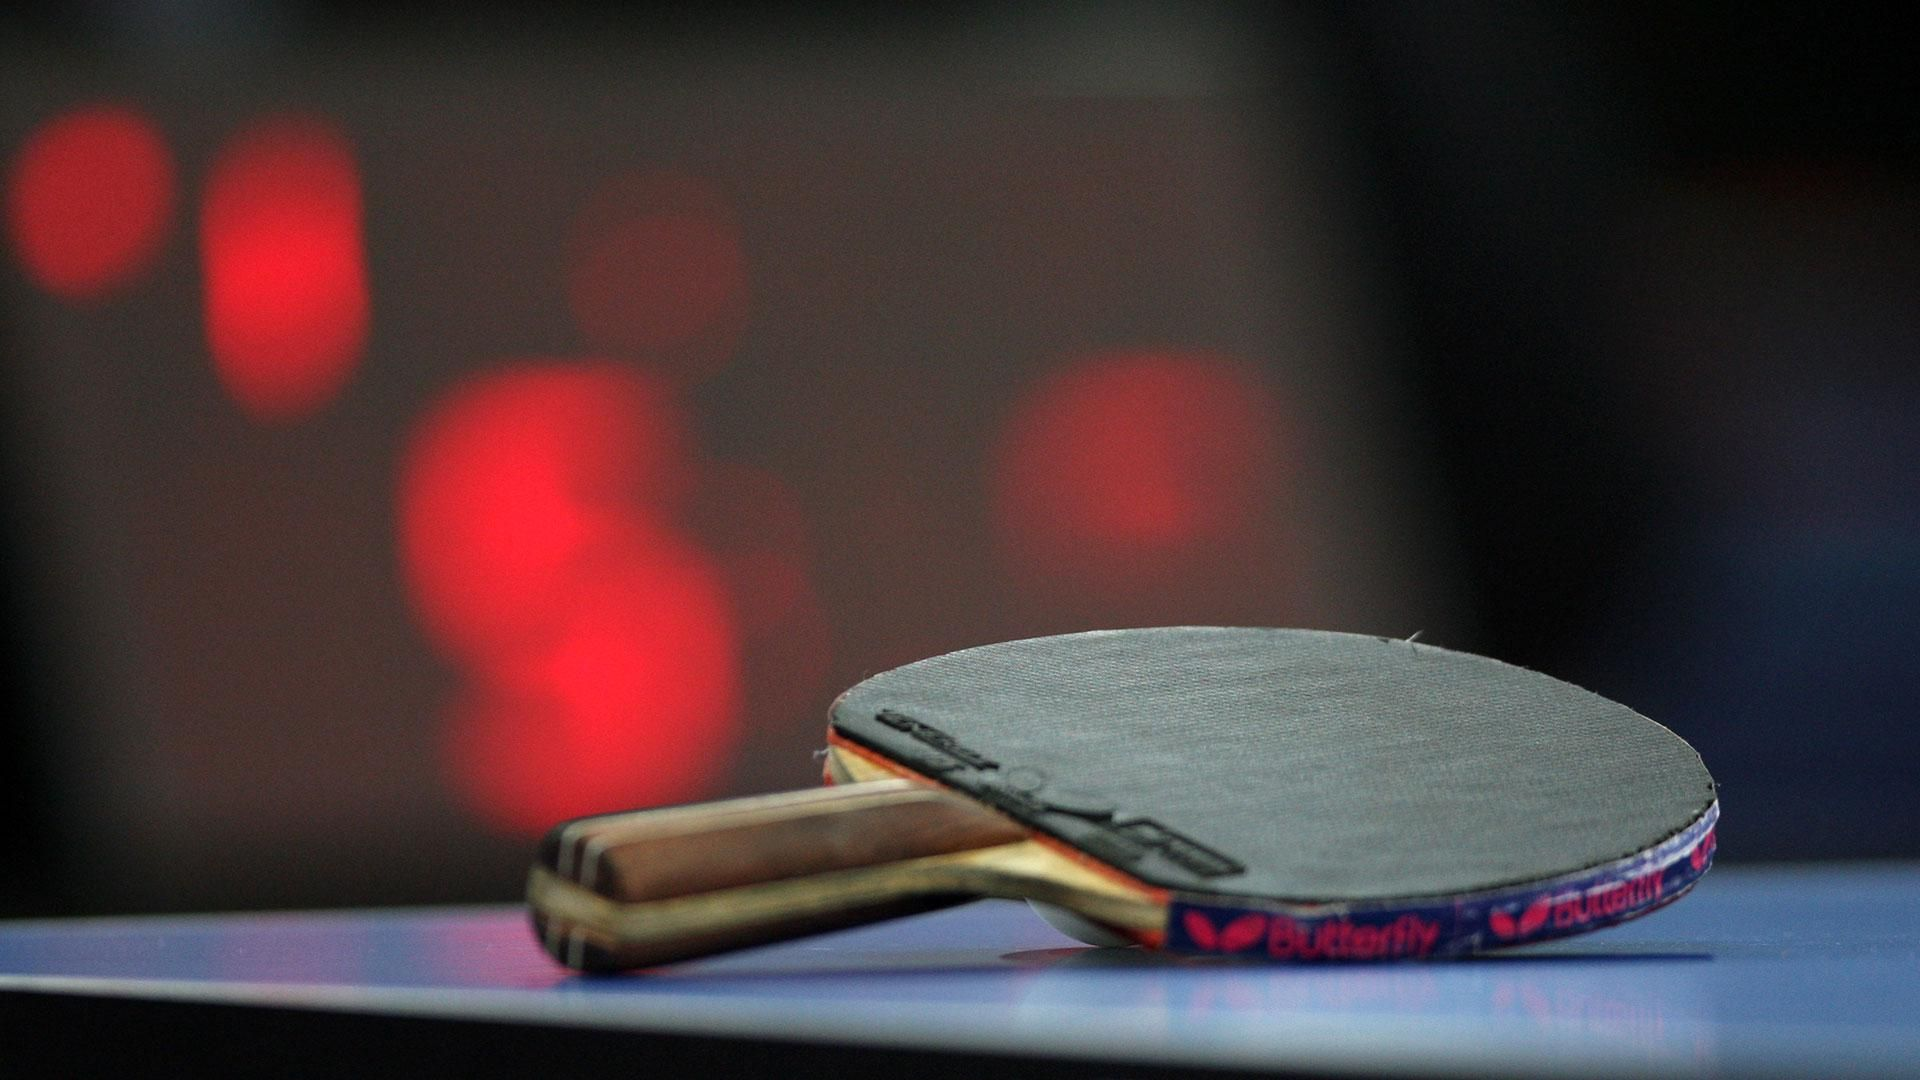 best table tennis bat